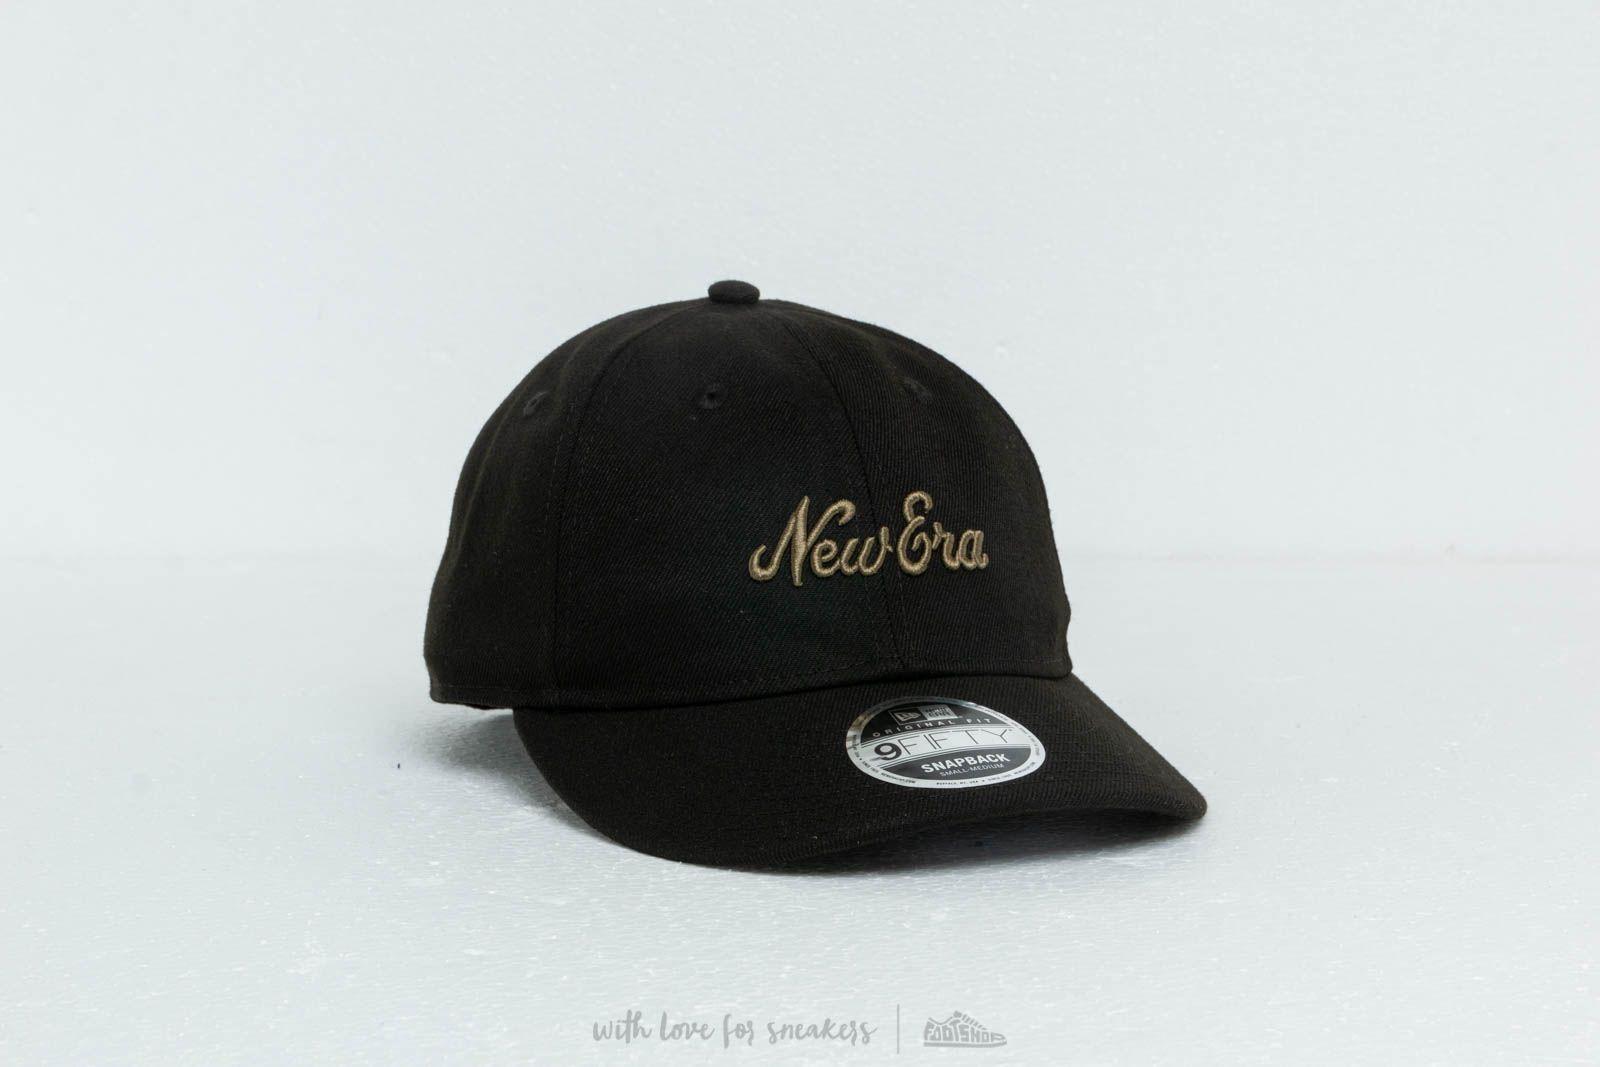 New Era 9Fifty Retro Crown Cap